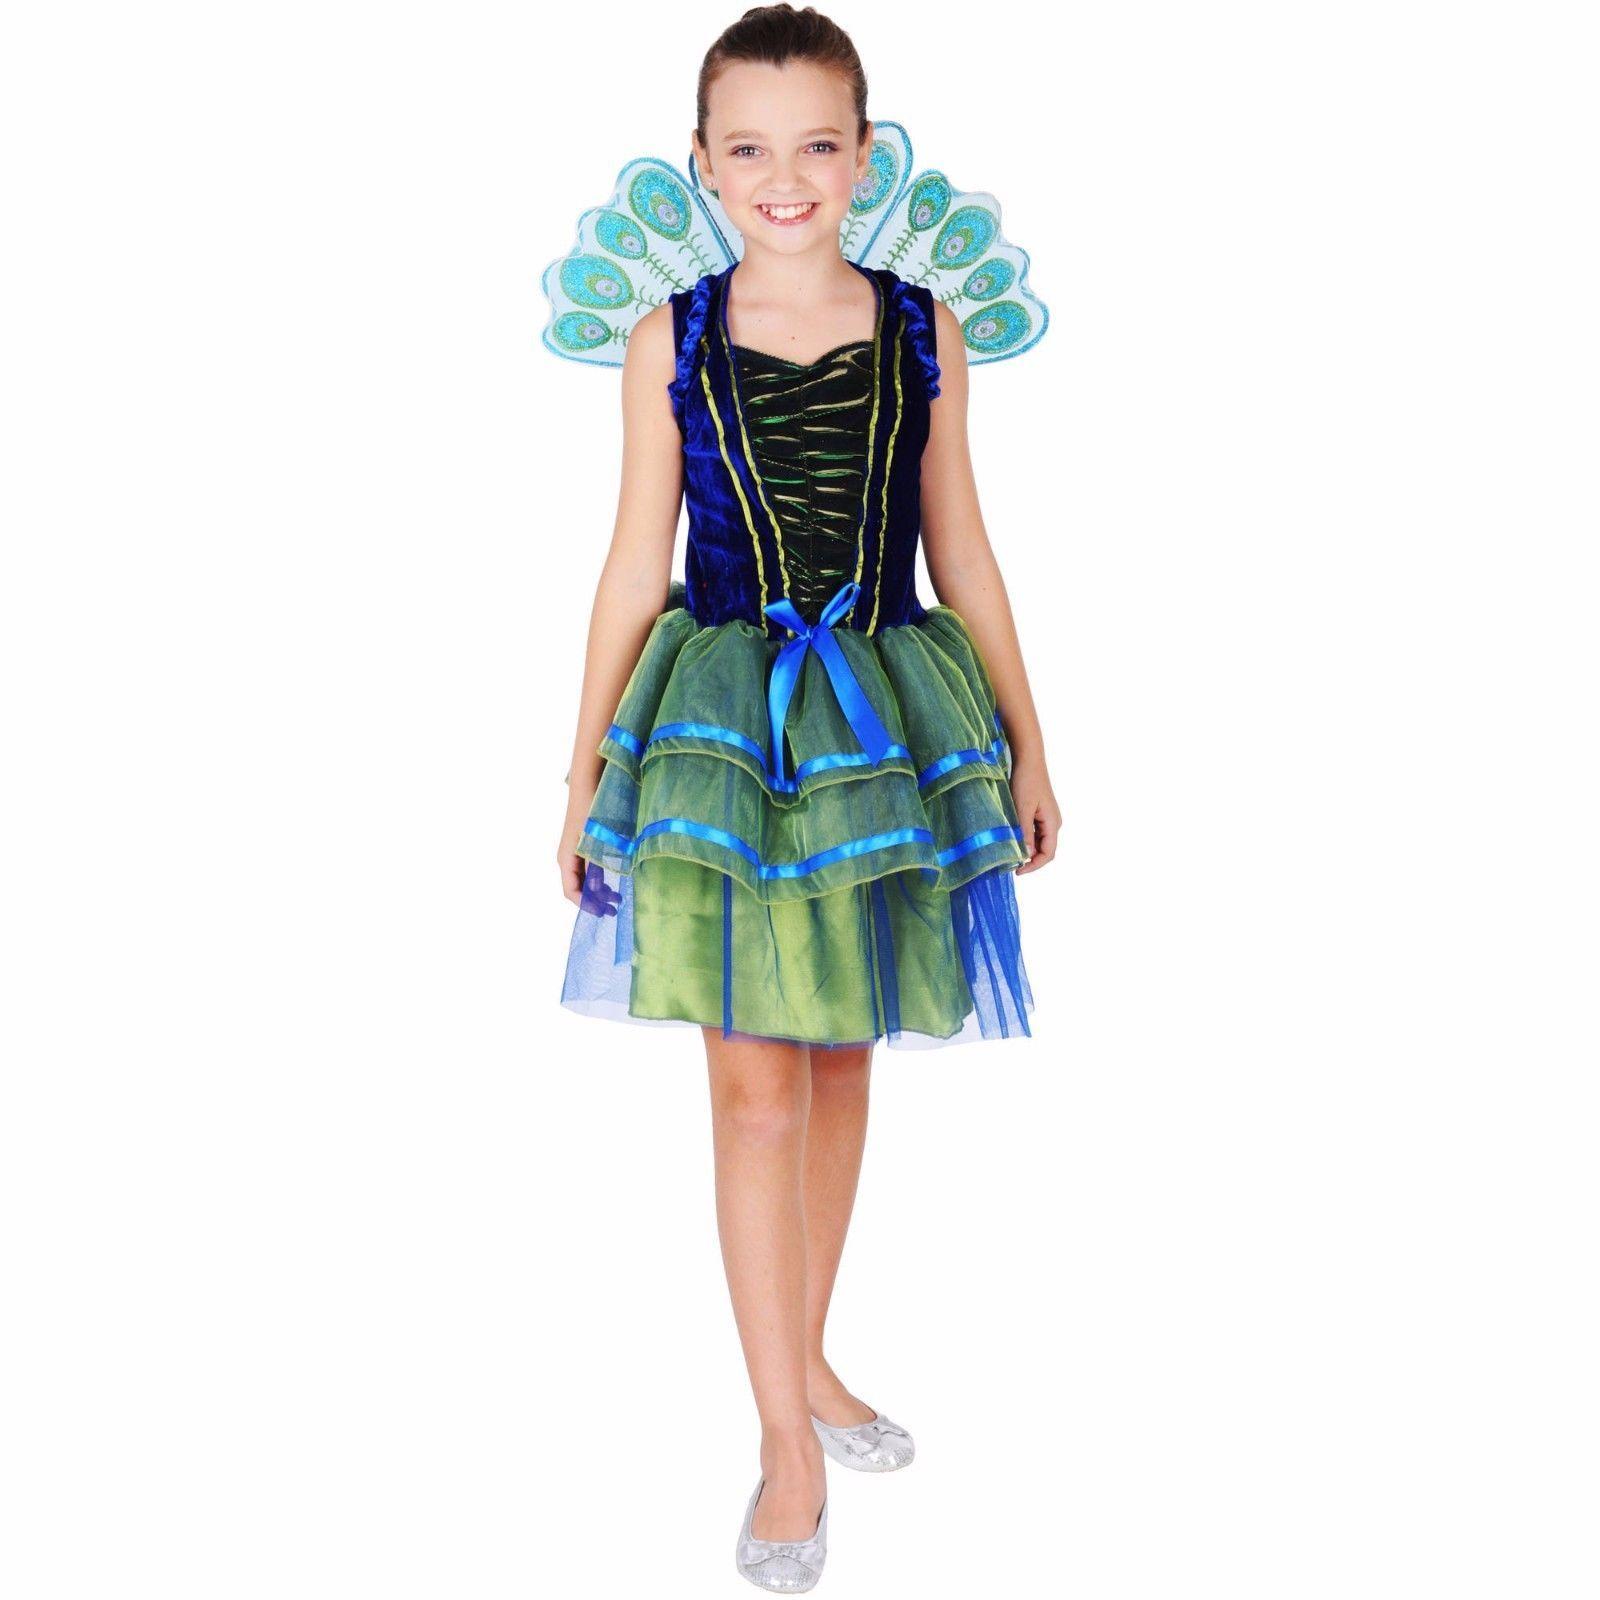 pretty peacock costume halloween dress up child girl kids | common